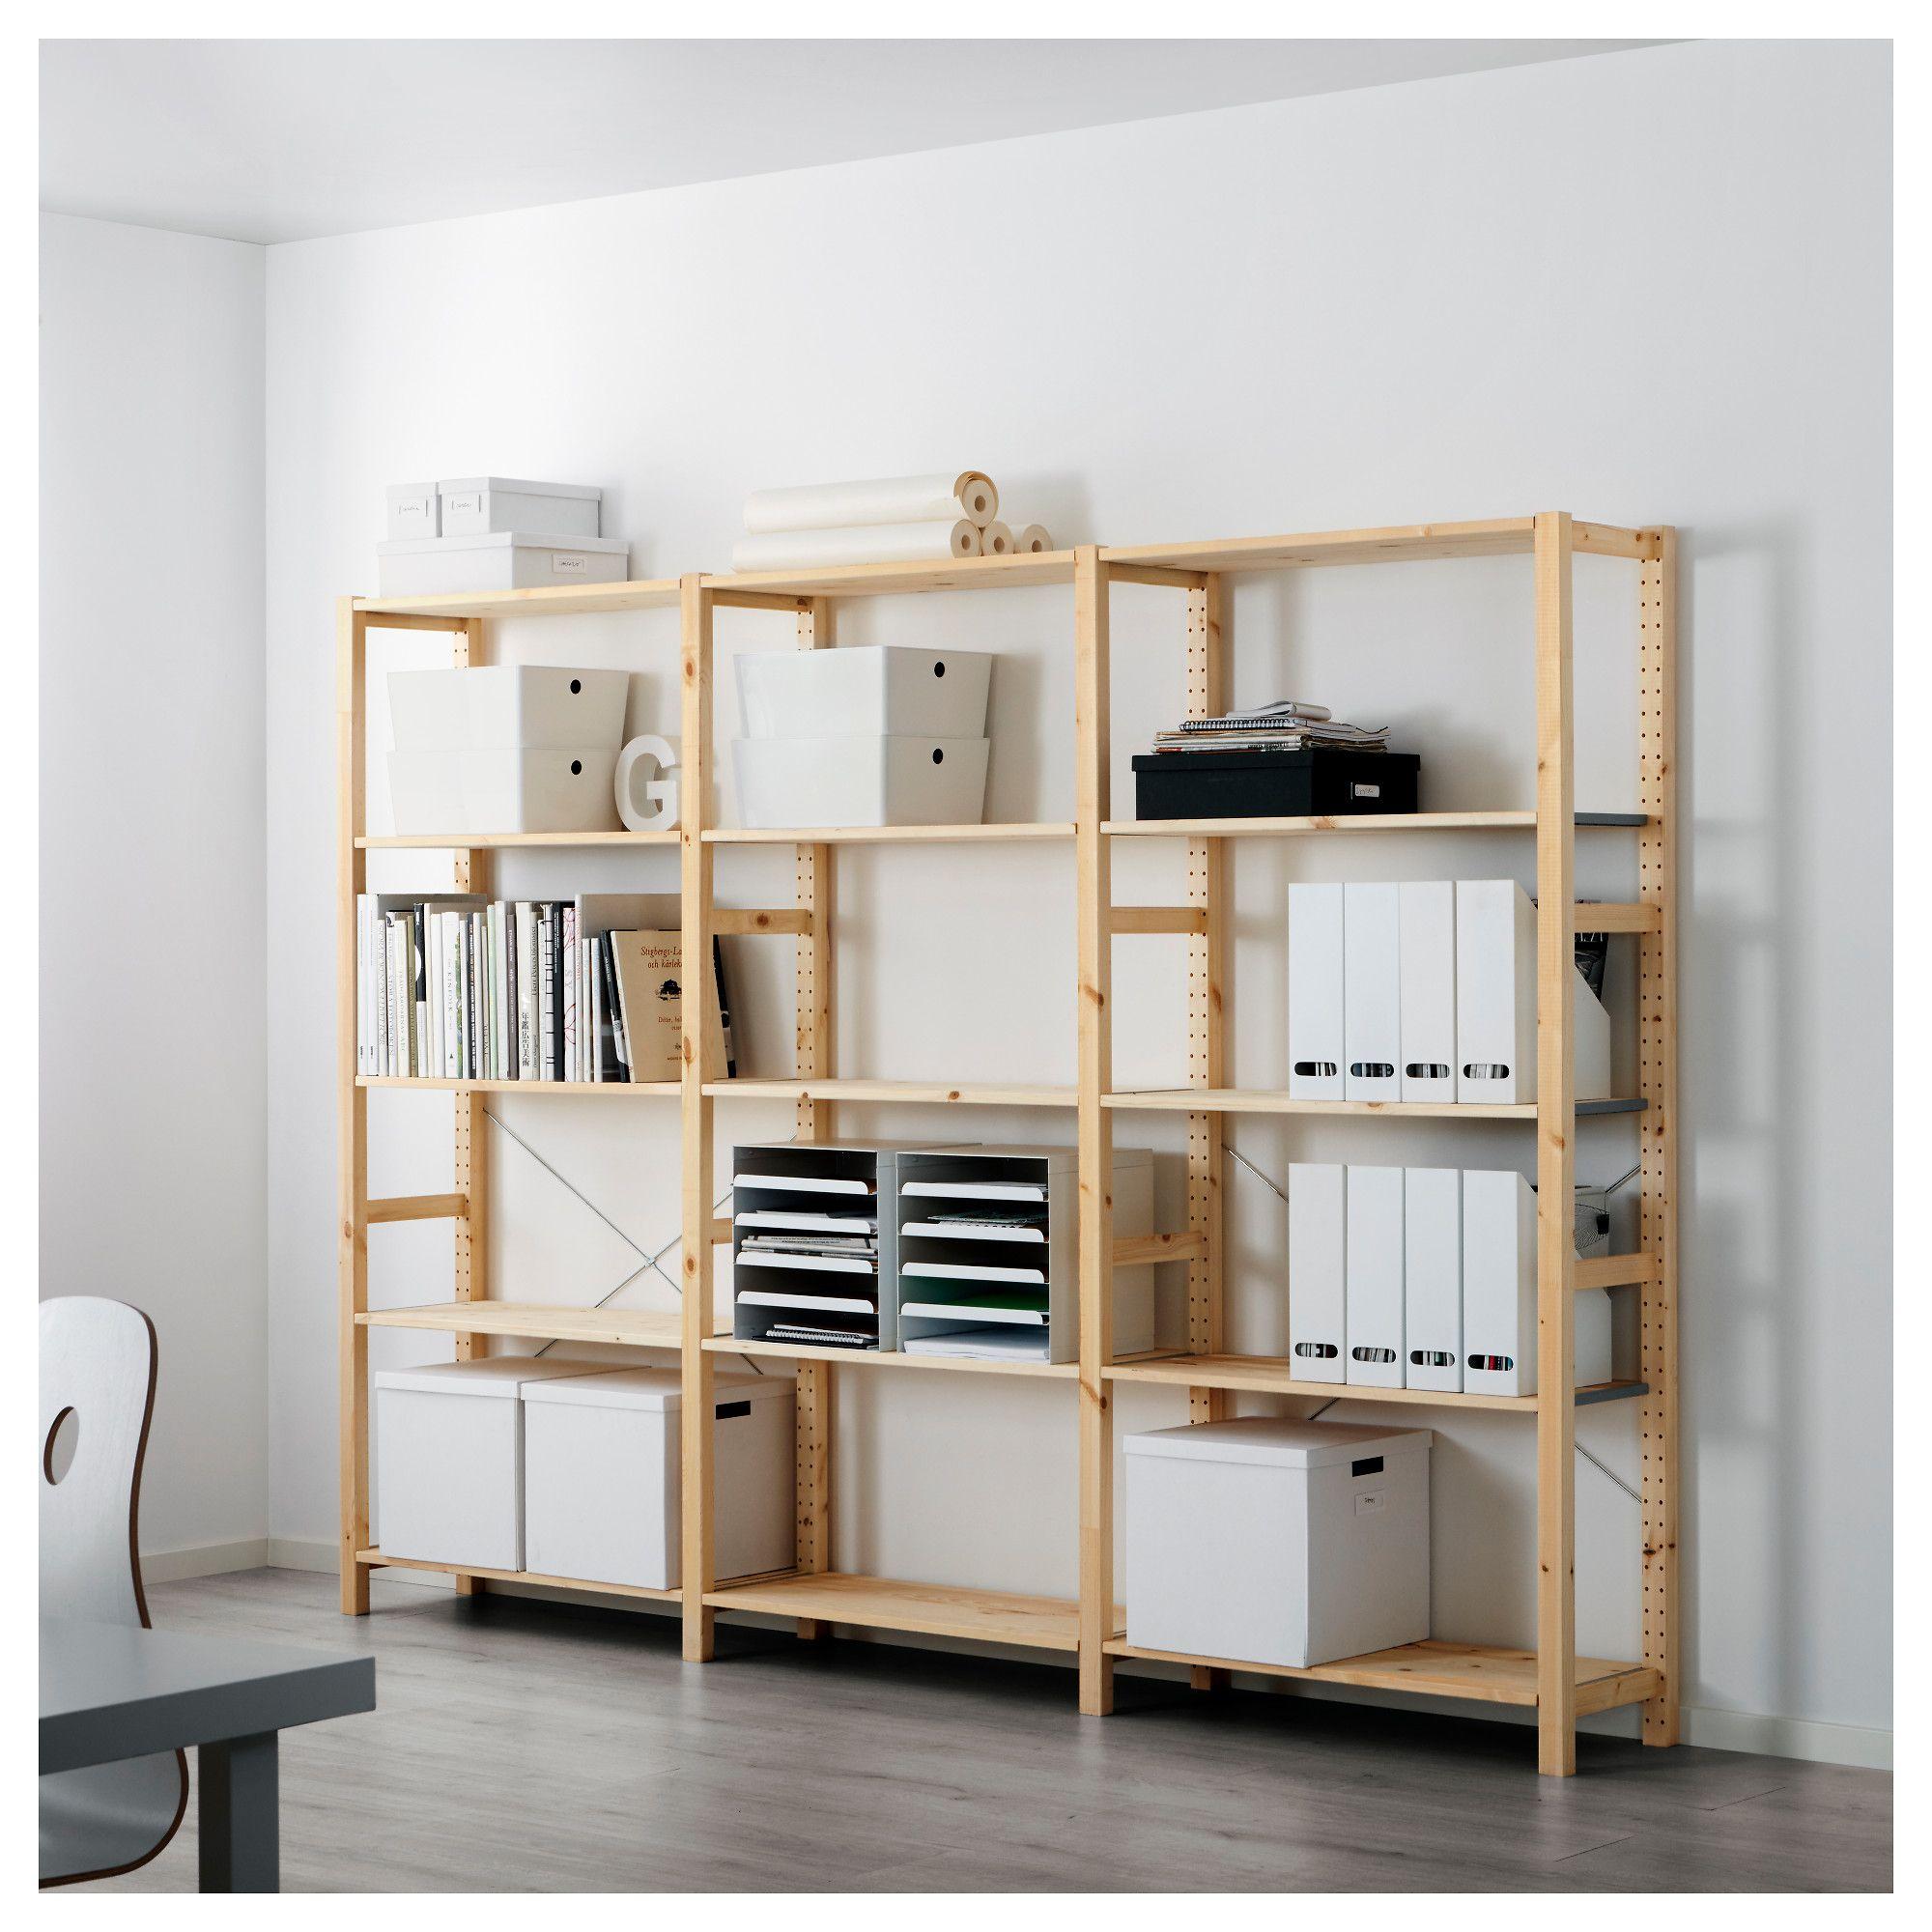 Ikea Us Furniture And Home Furnishings Ikea Ivar Shelving Ikea Shelving Unit